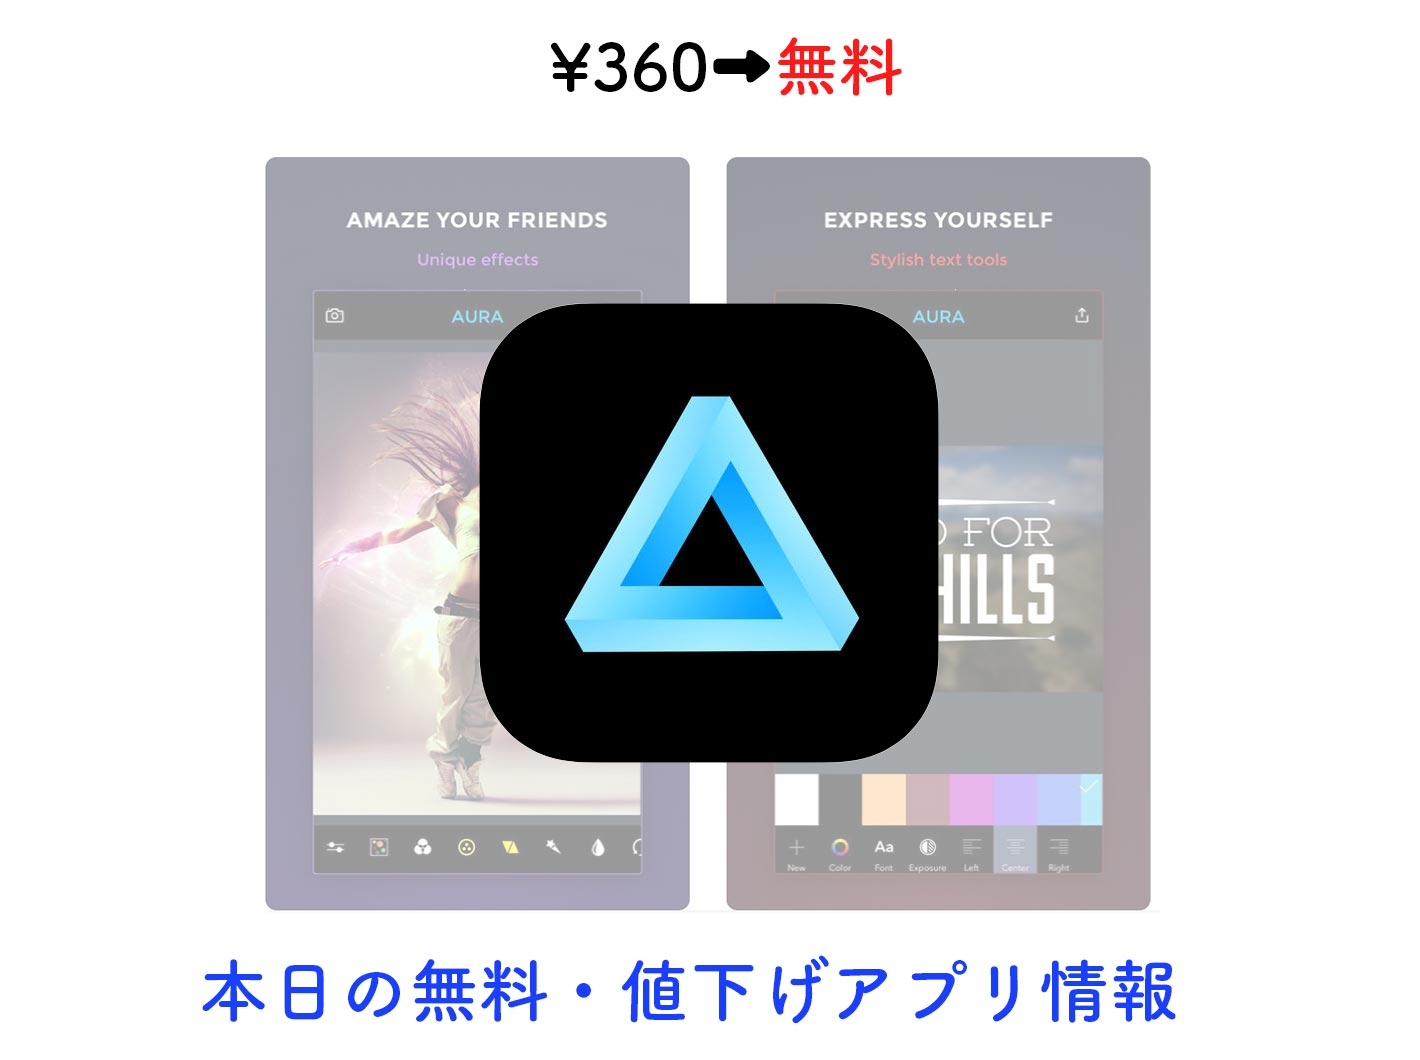 Appsale0625